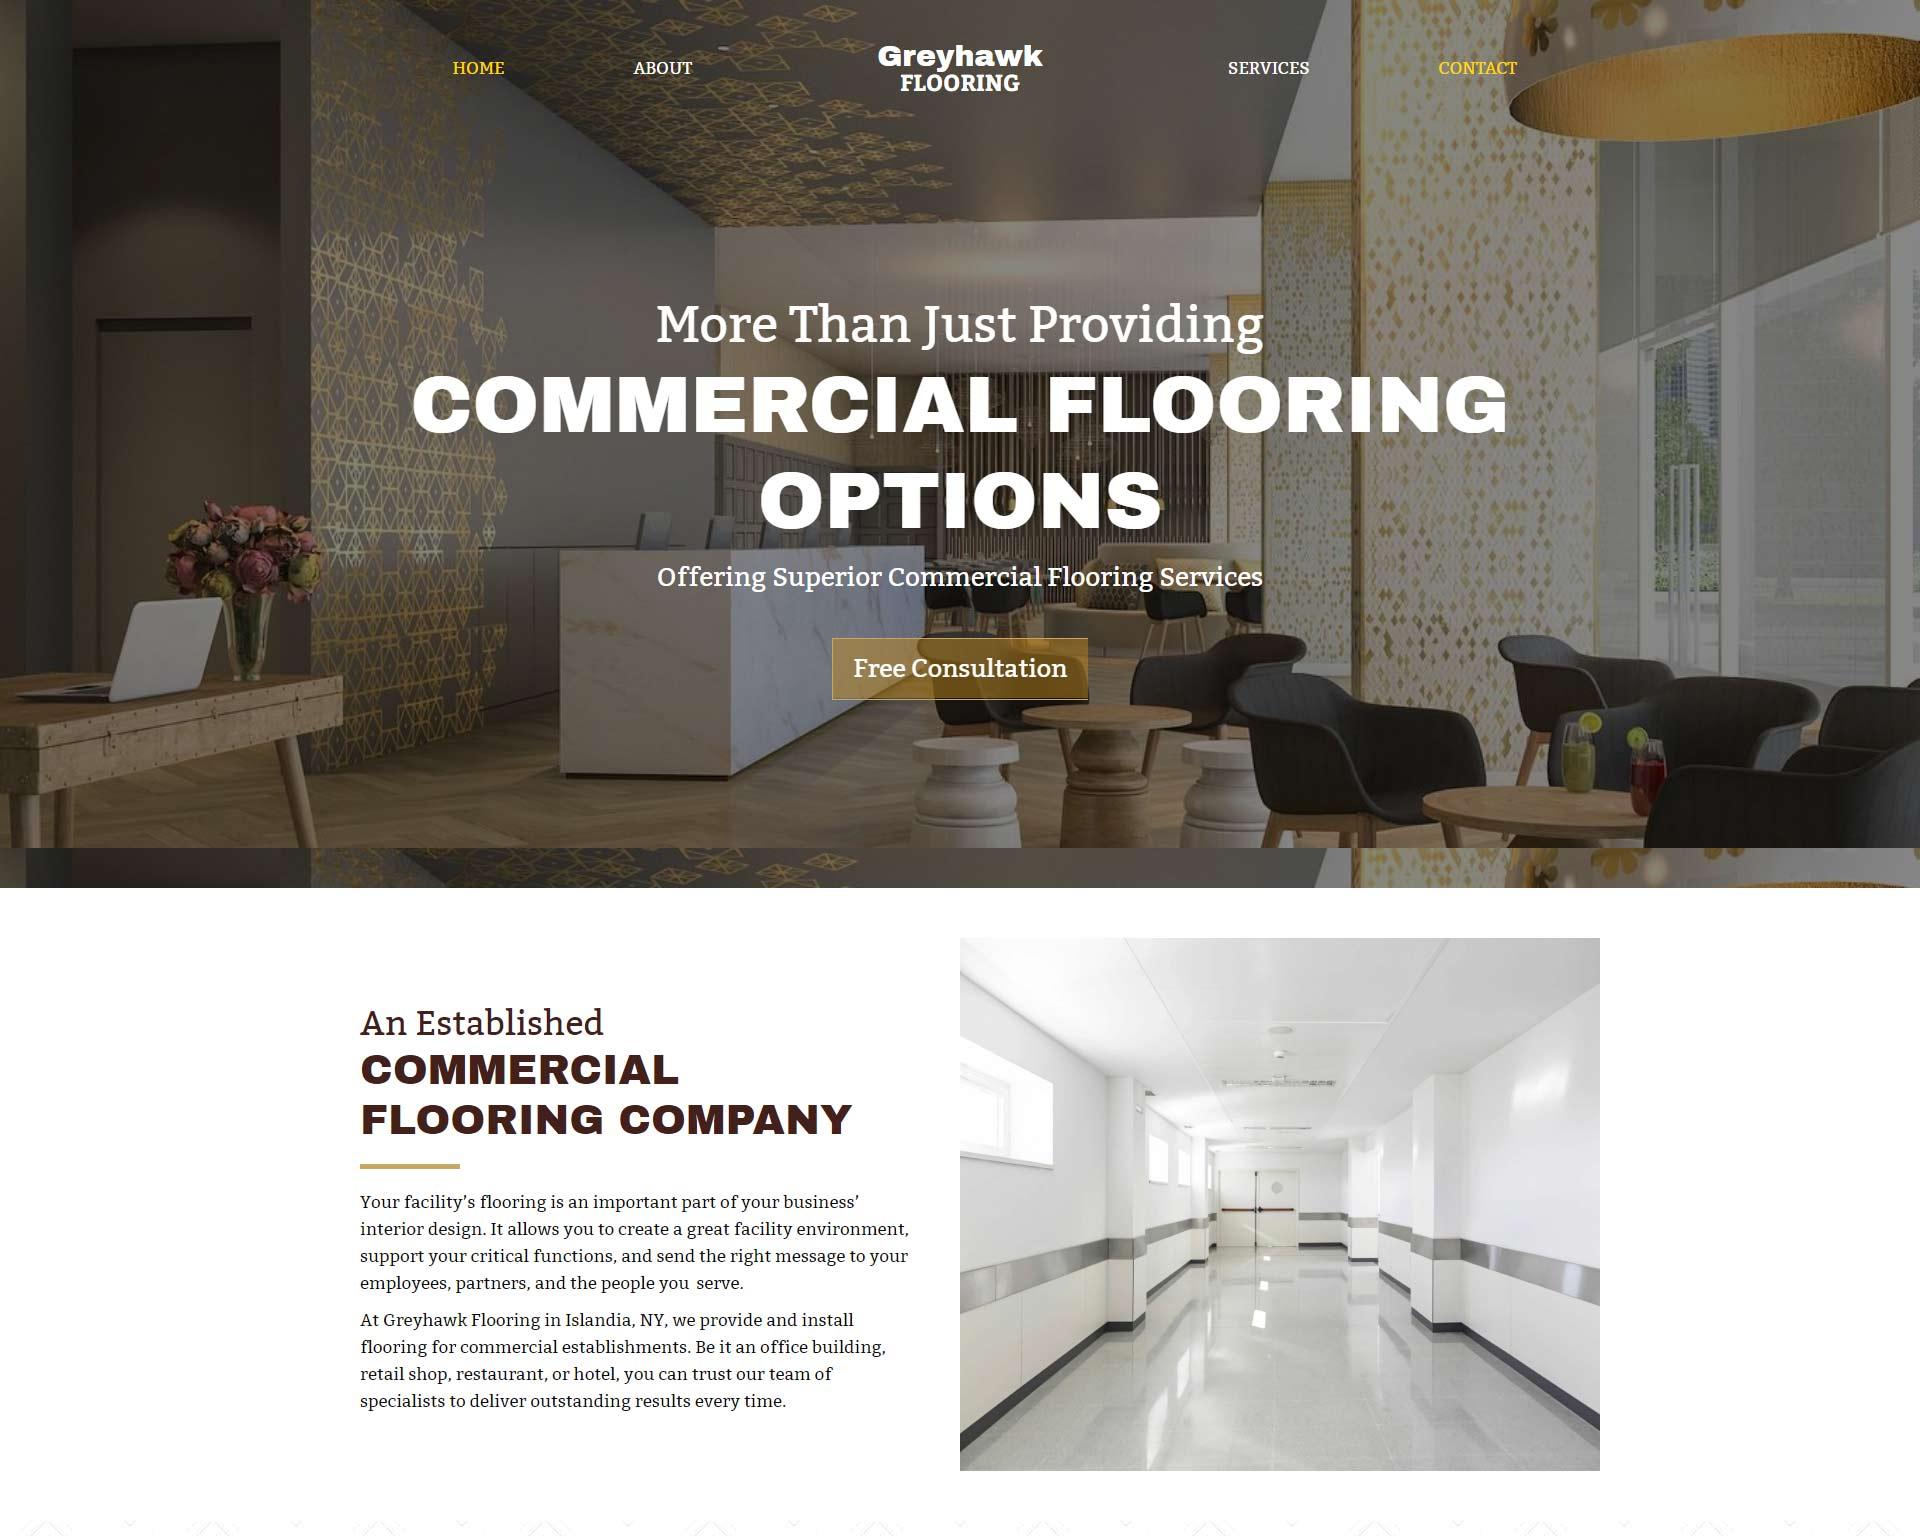 Home---Greyhawk-Flooring